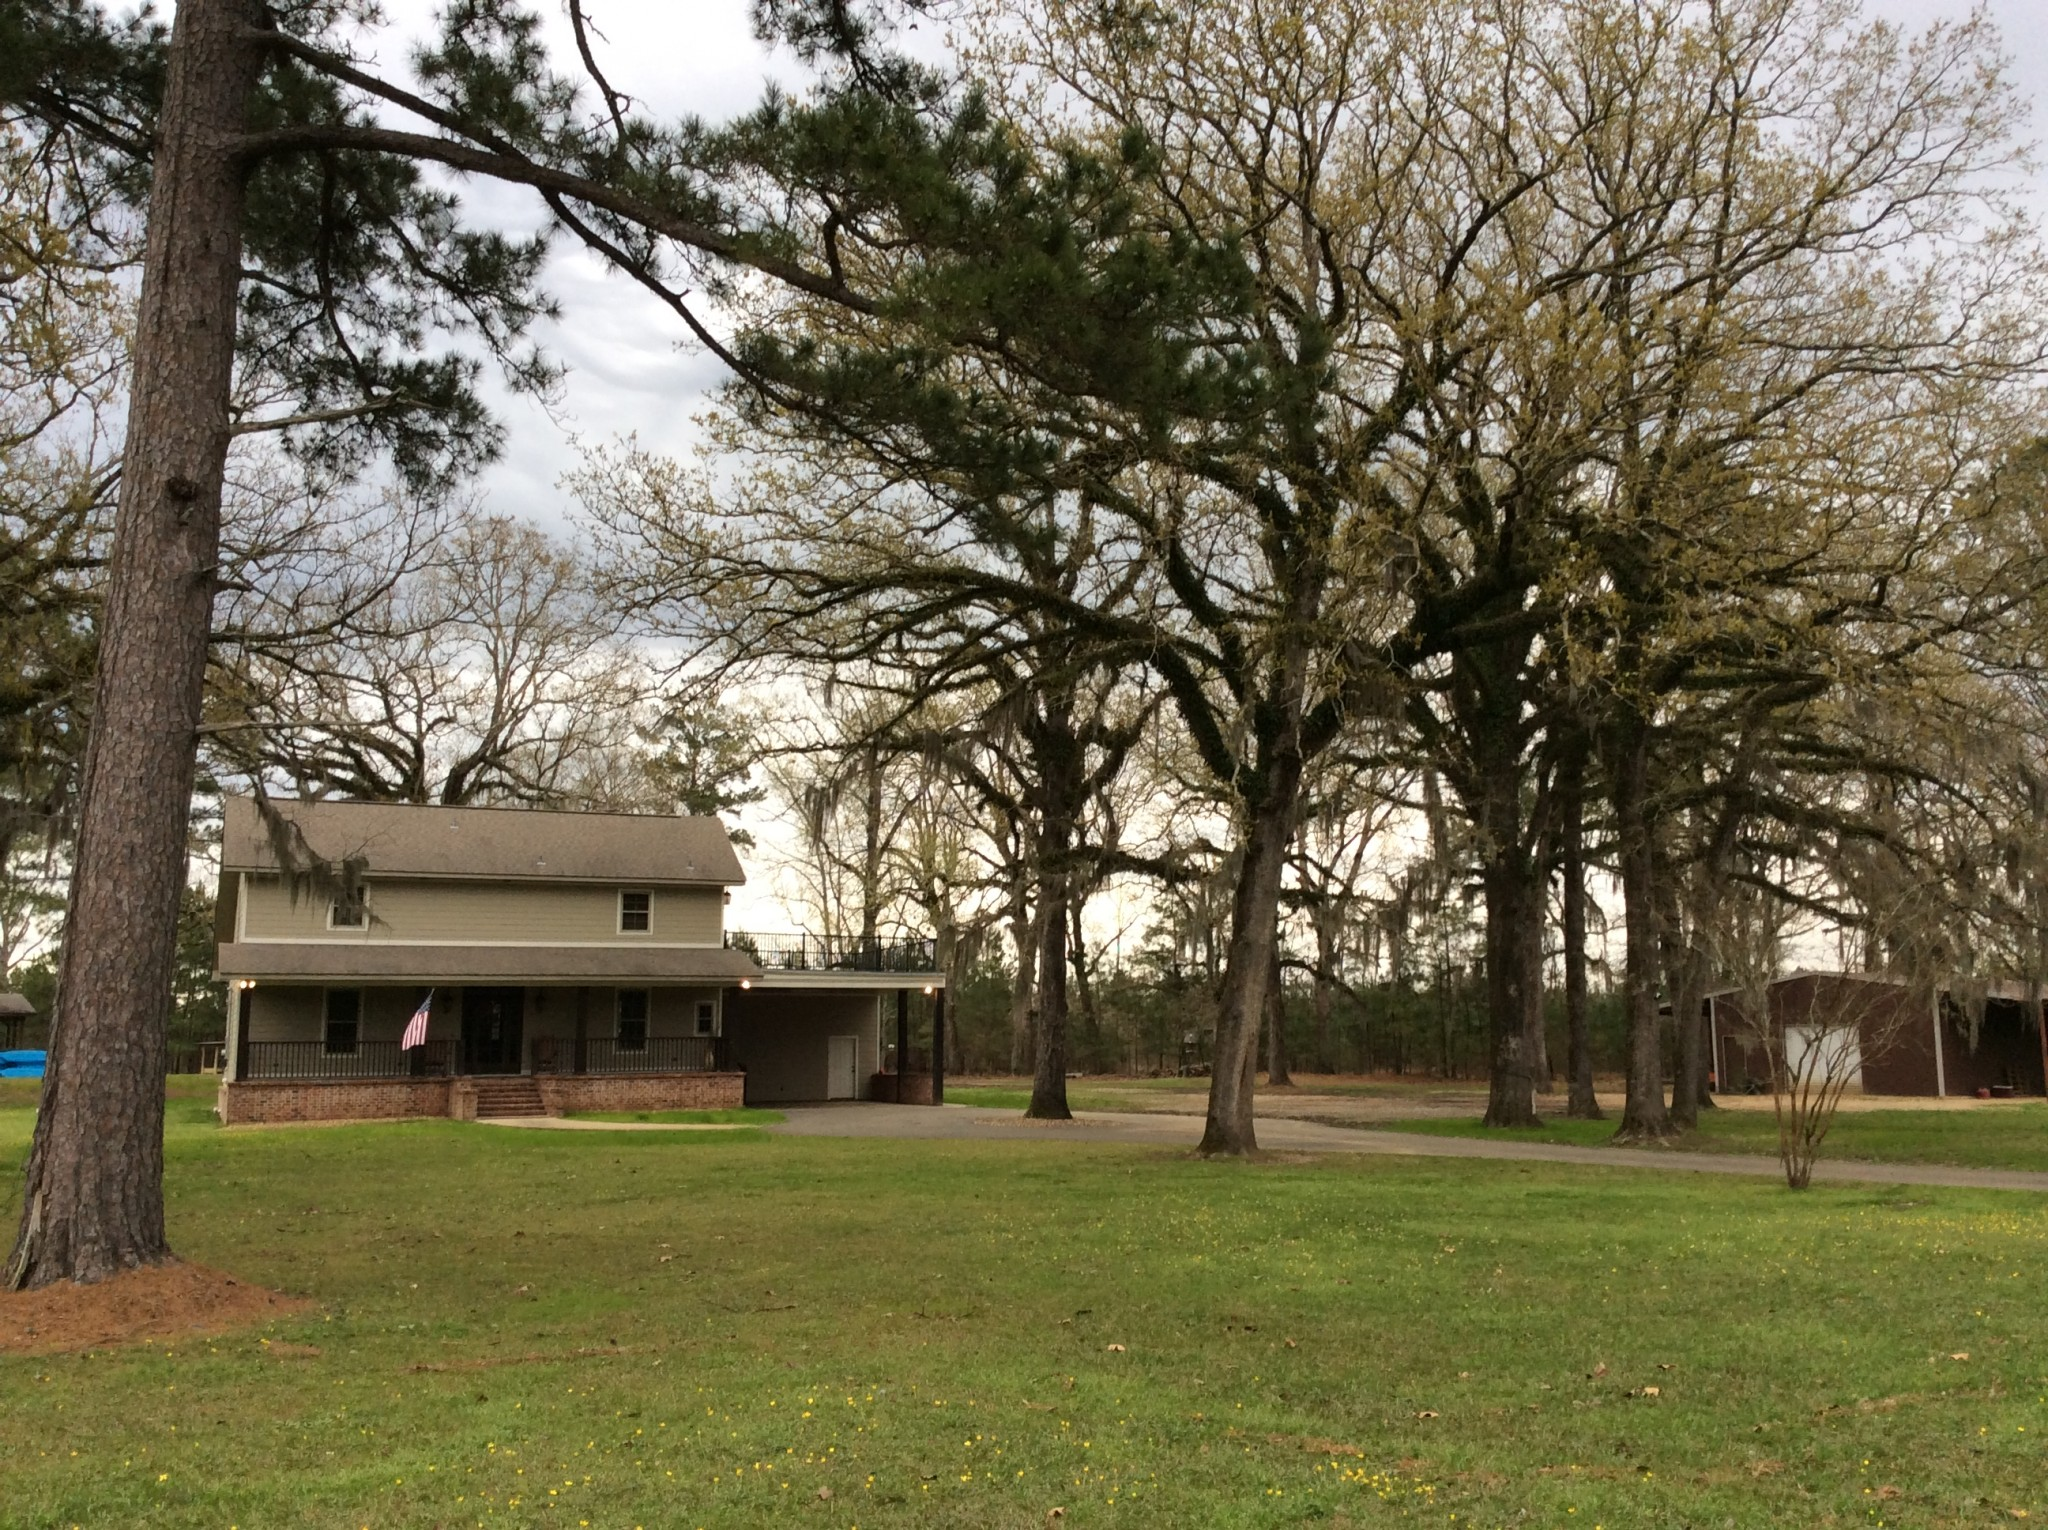 Center Point Lodge, Avoyelles Parish, 75 Acres +/-